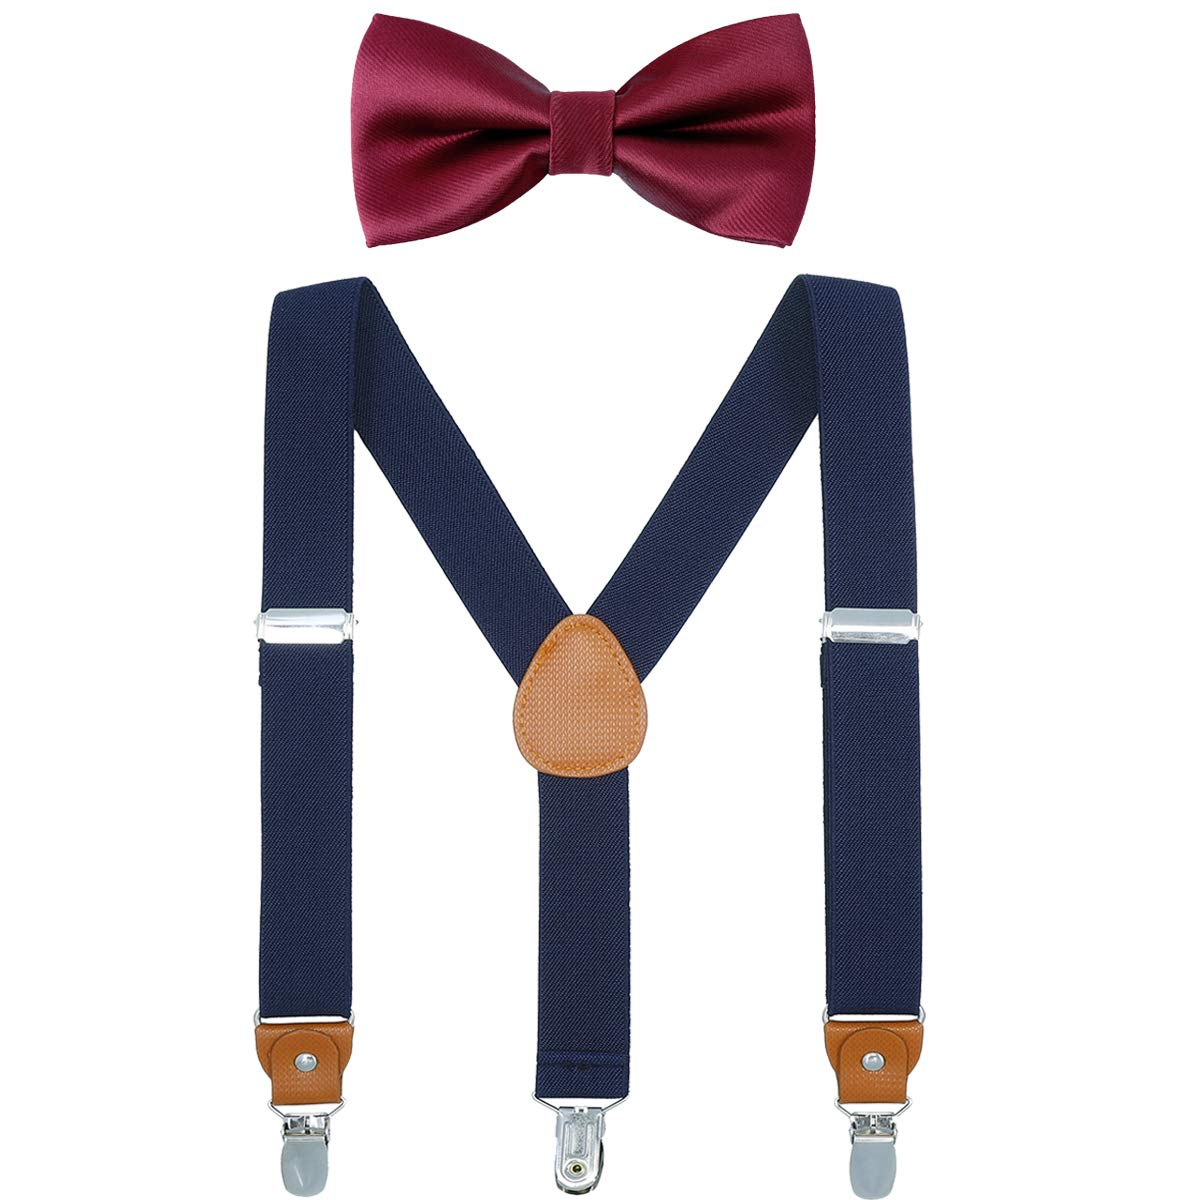 Child Boys Adjustable Silk Bowties & Suspender Sets Y Back Metal Clips Genuine Leather Suspenders (Navy + Burgundy bowtie) by WELROG